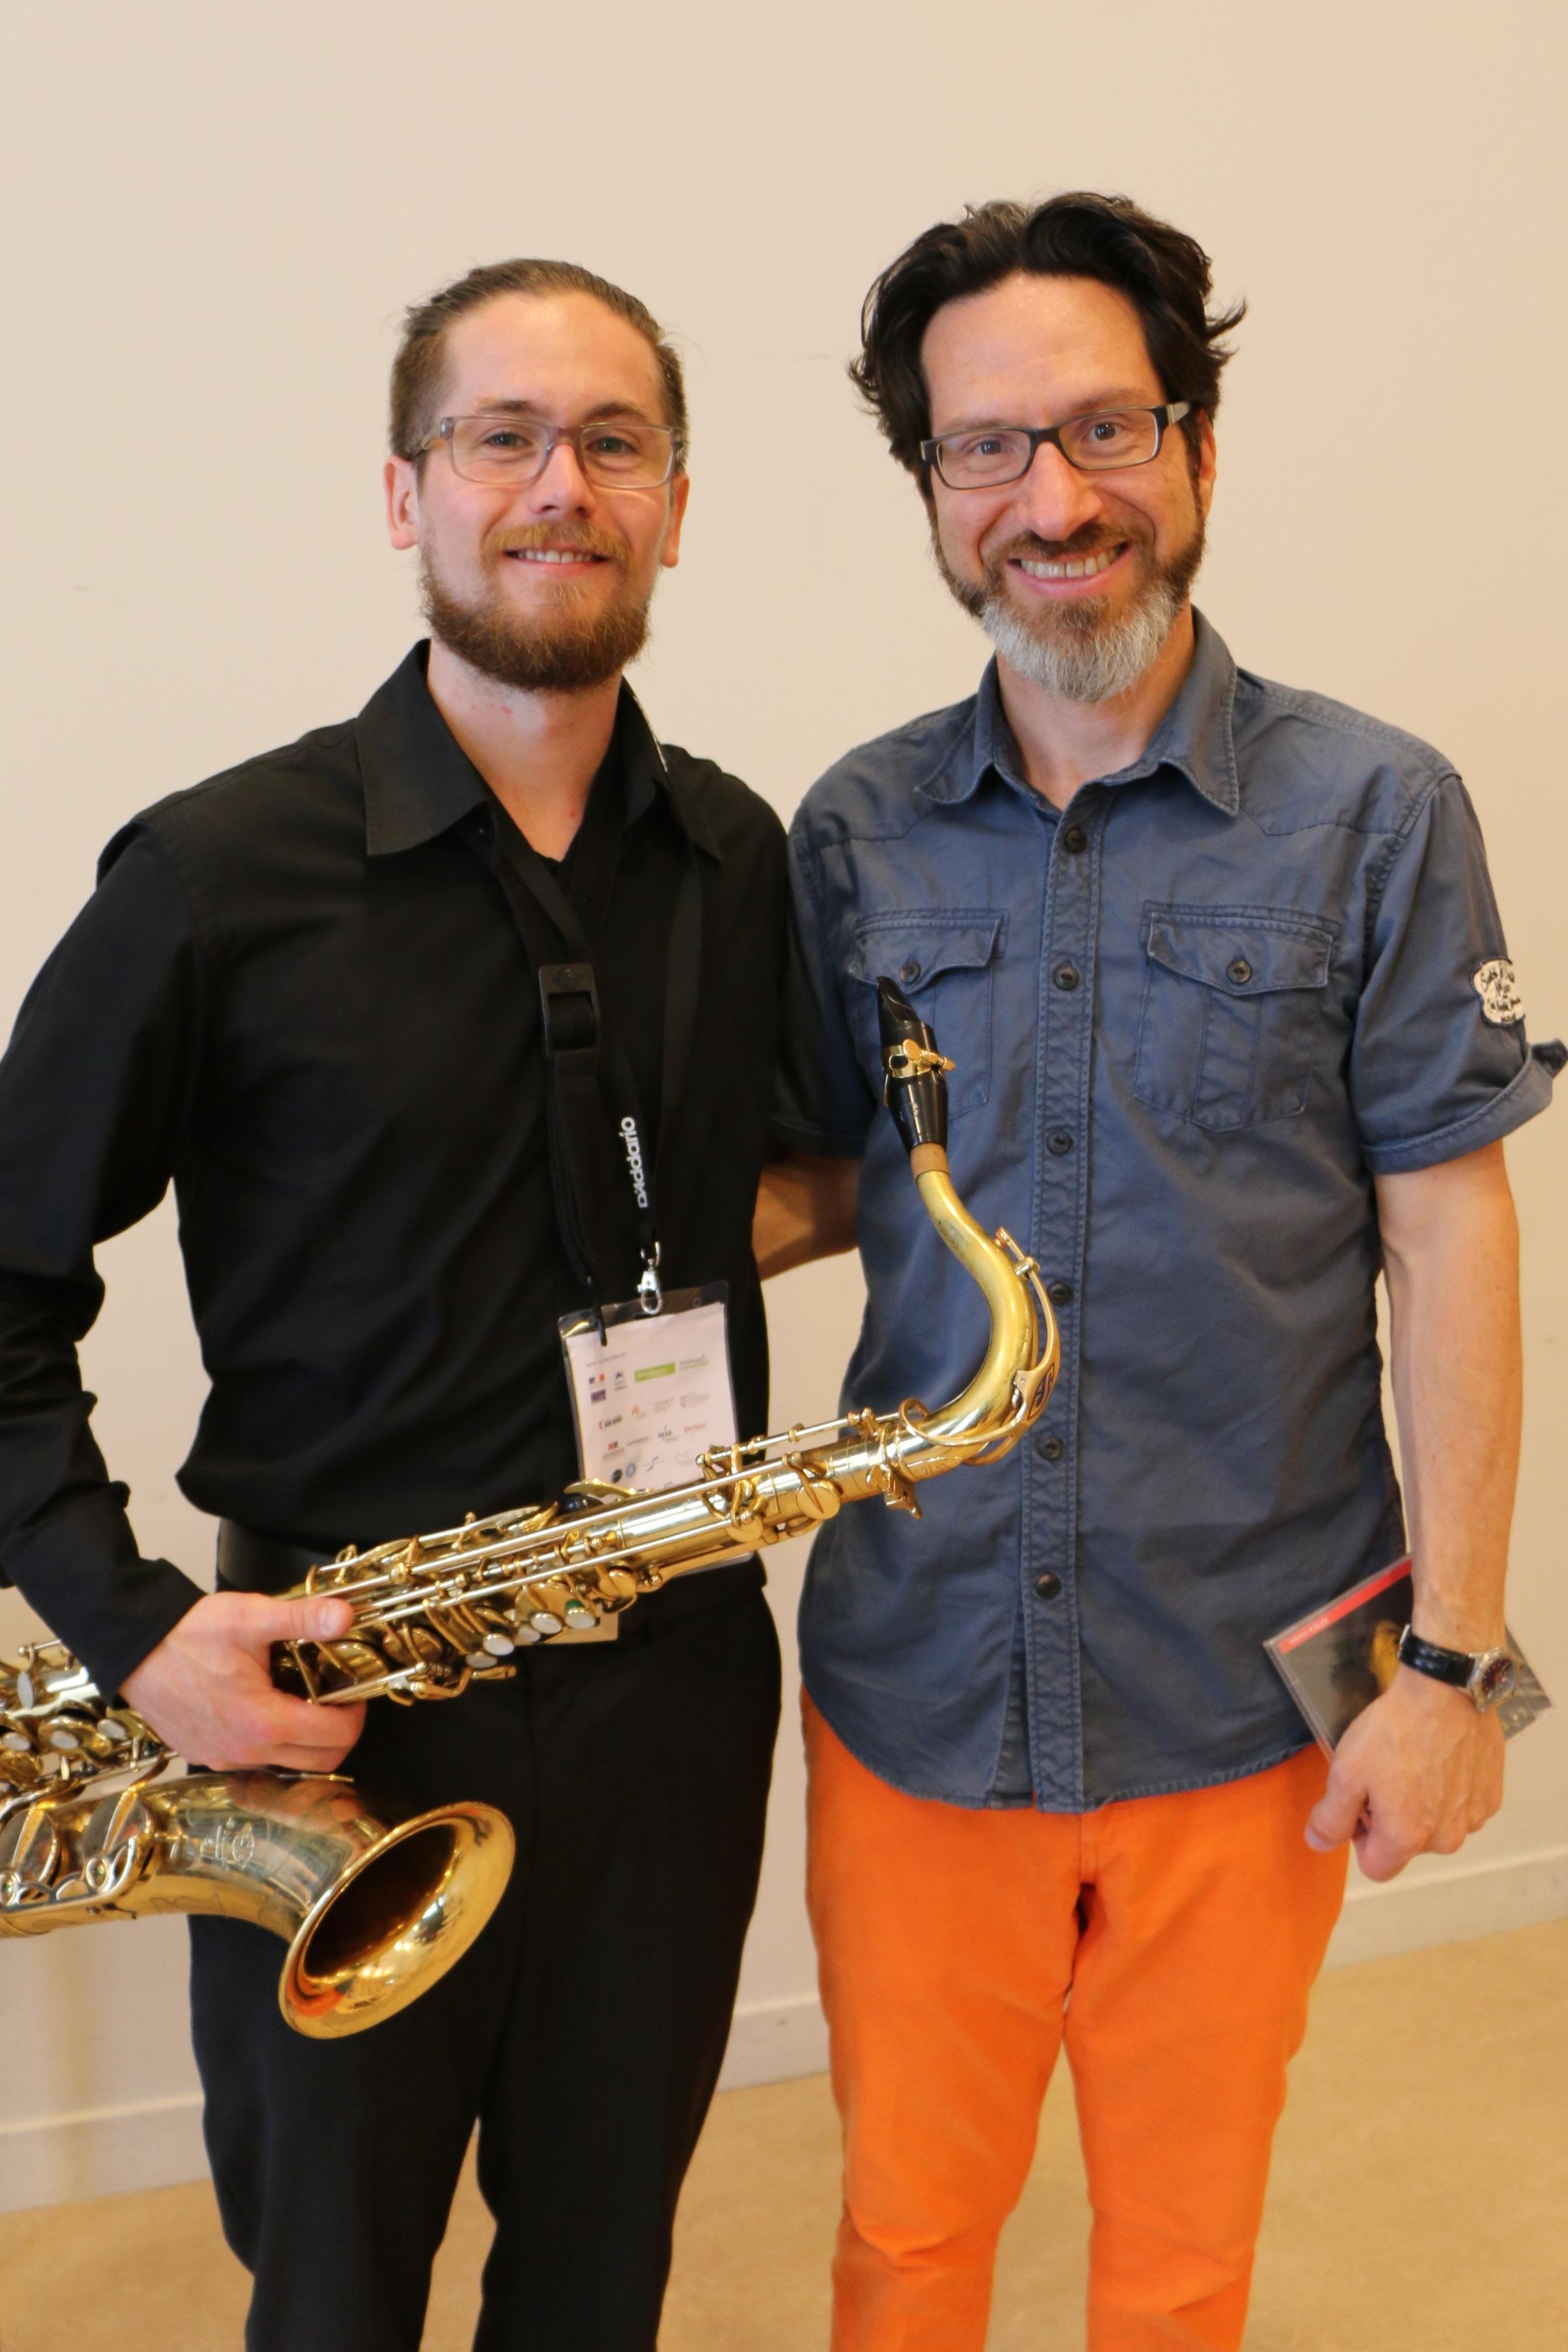 Gordon Fitzell et Tommy Davis, XVII Congrès mondial du saxophone (2015) à Strasbourg, France